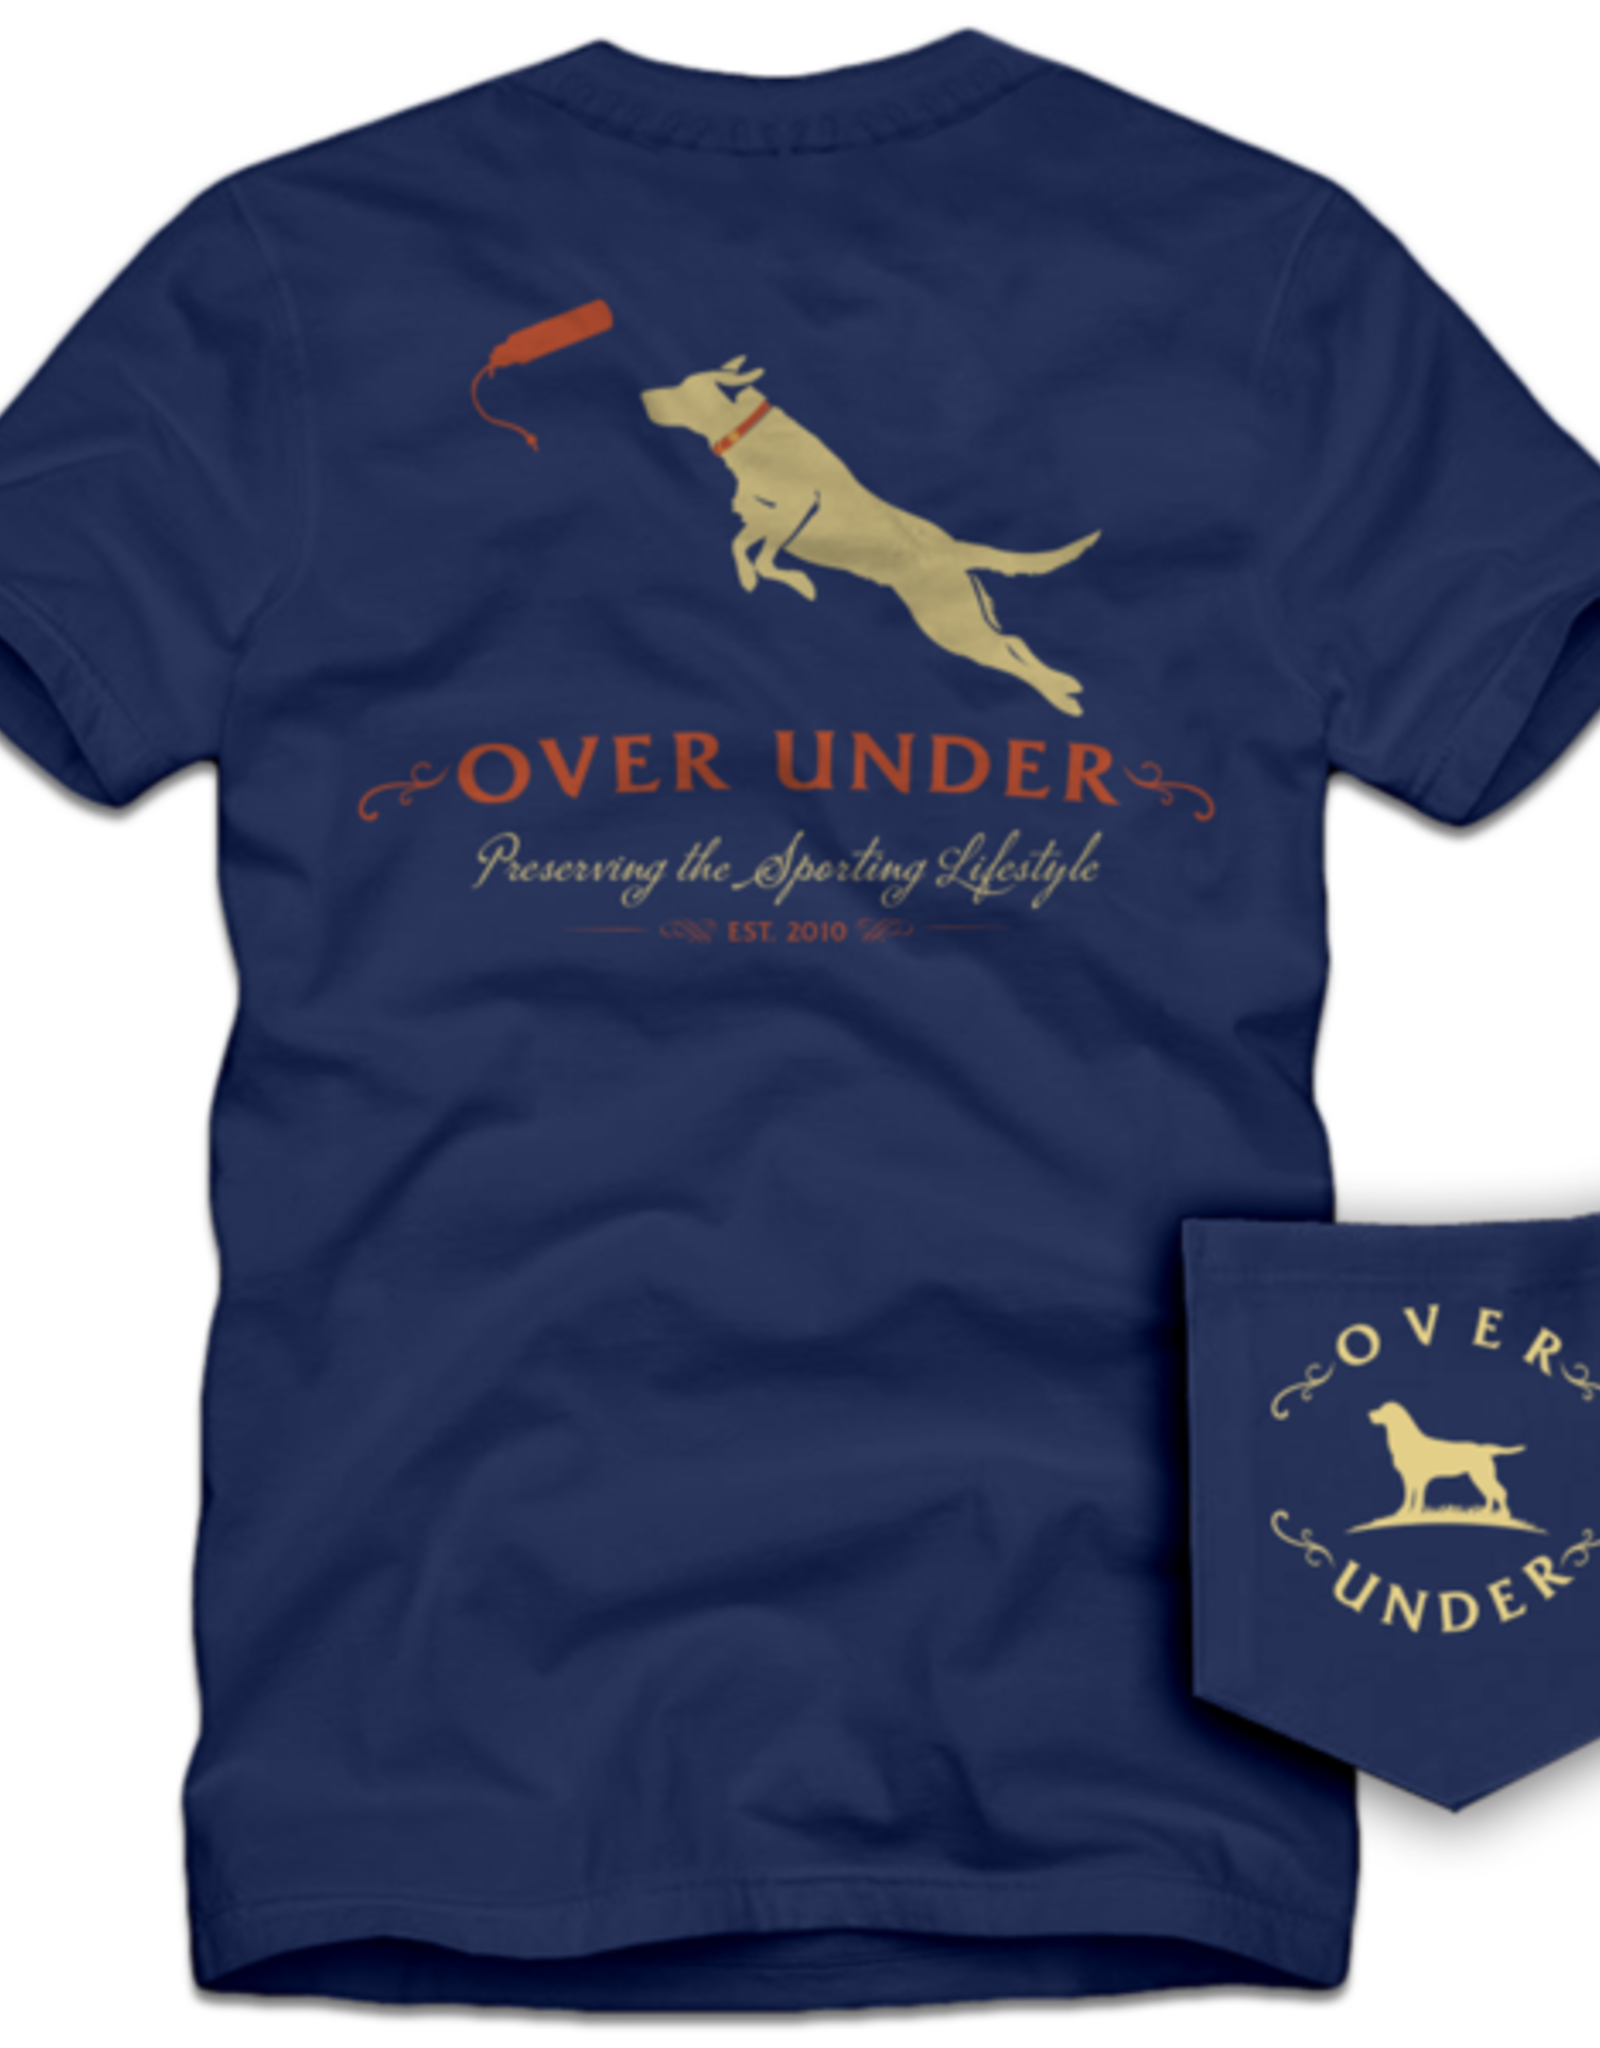 Over Under Clothing Dock Dog Tee